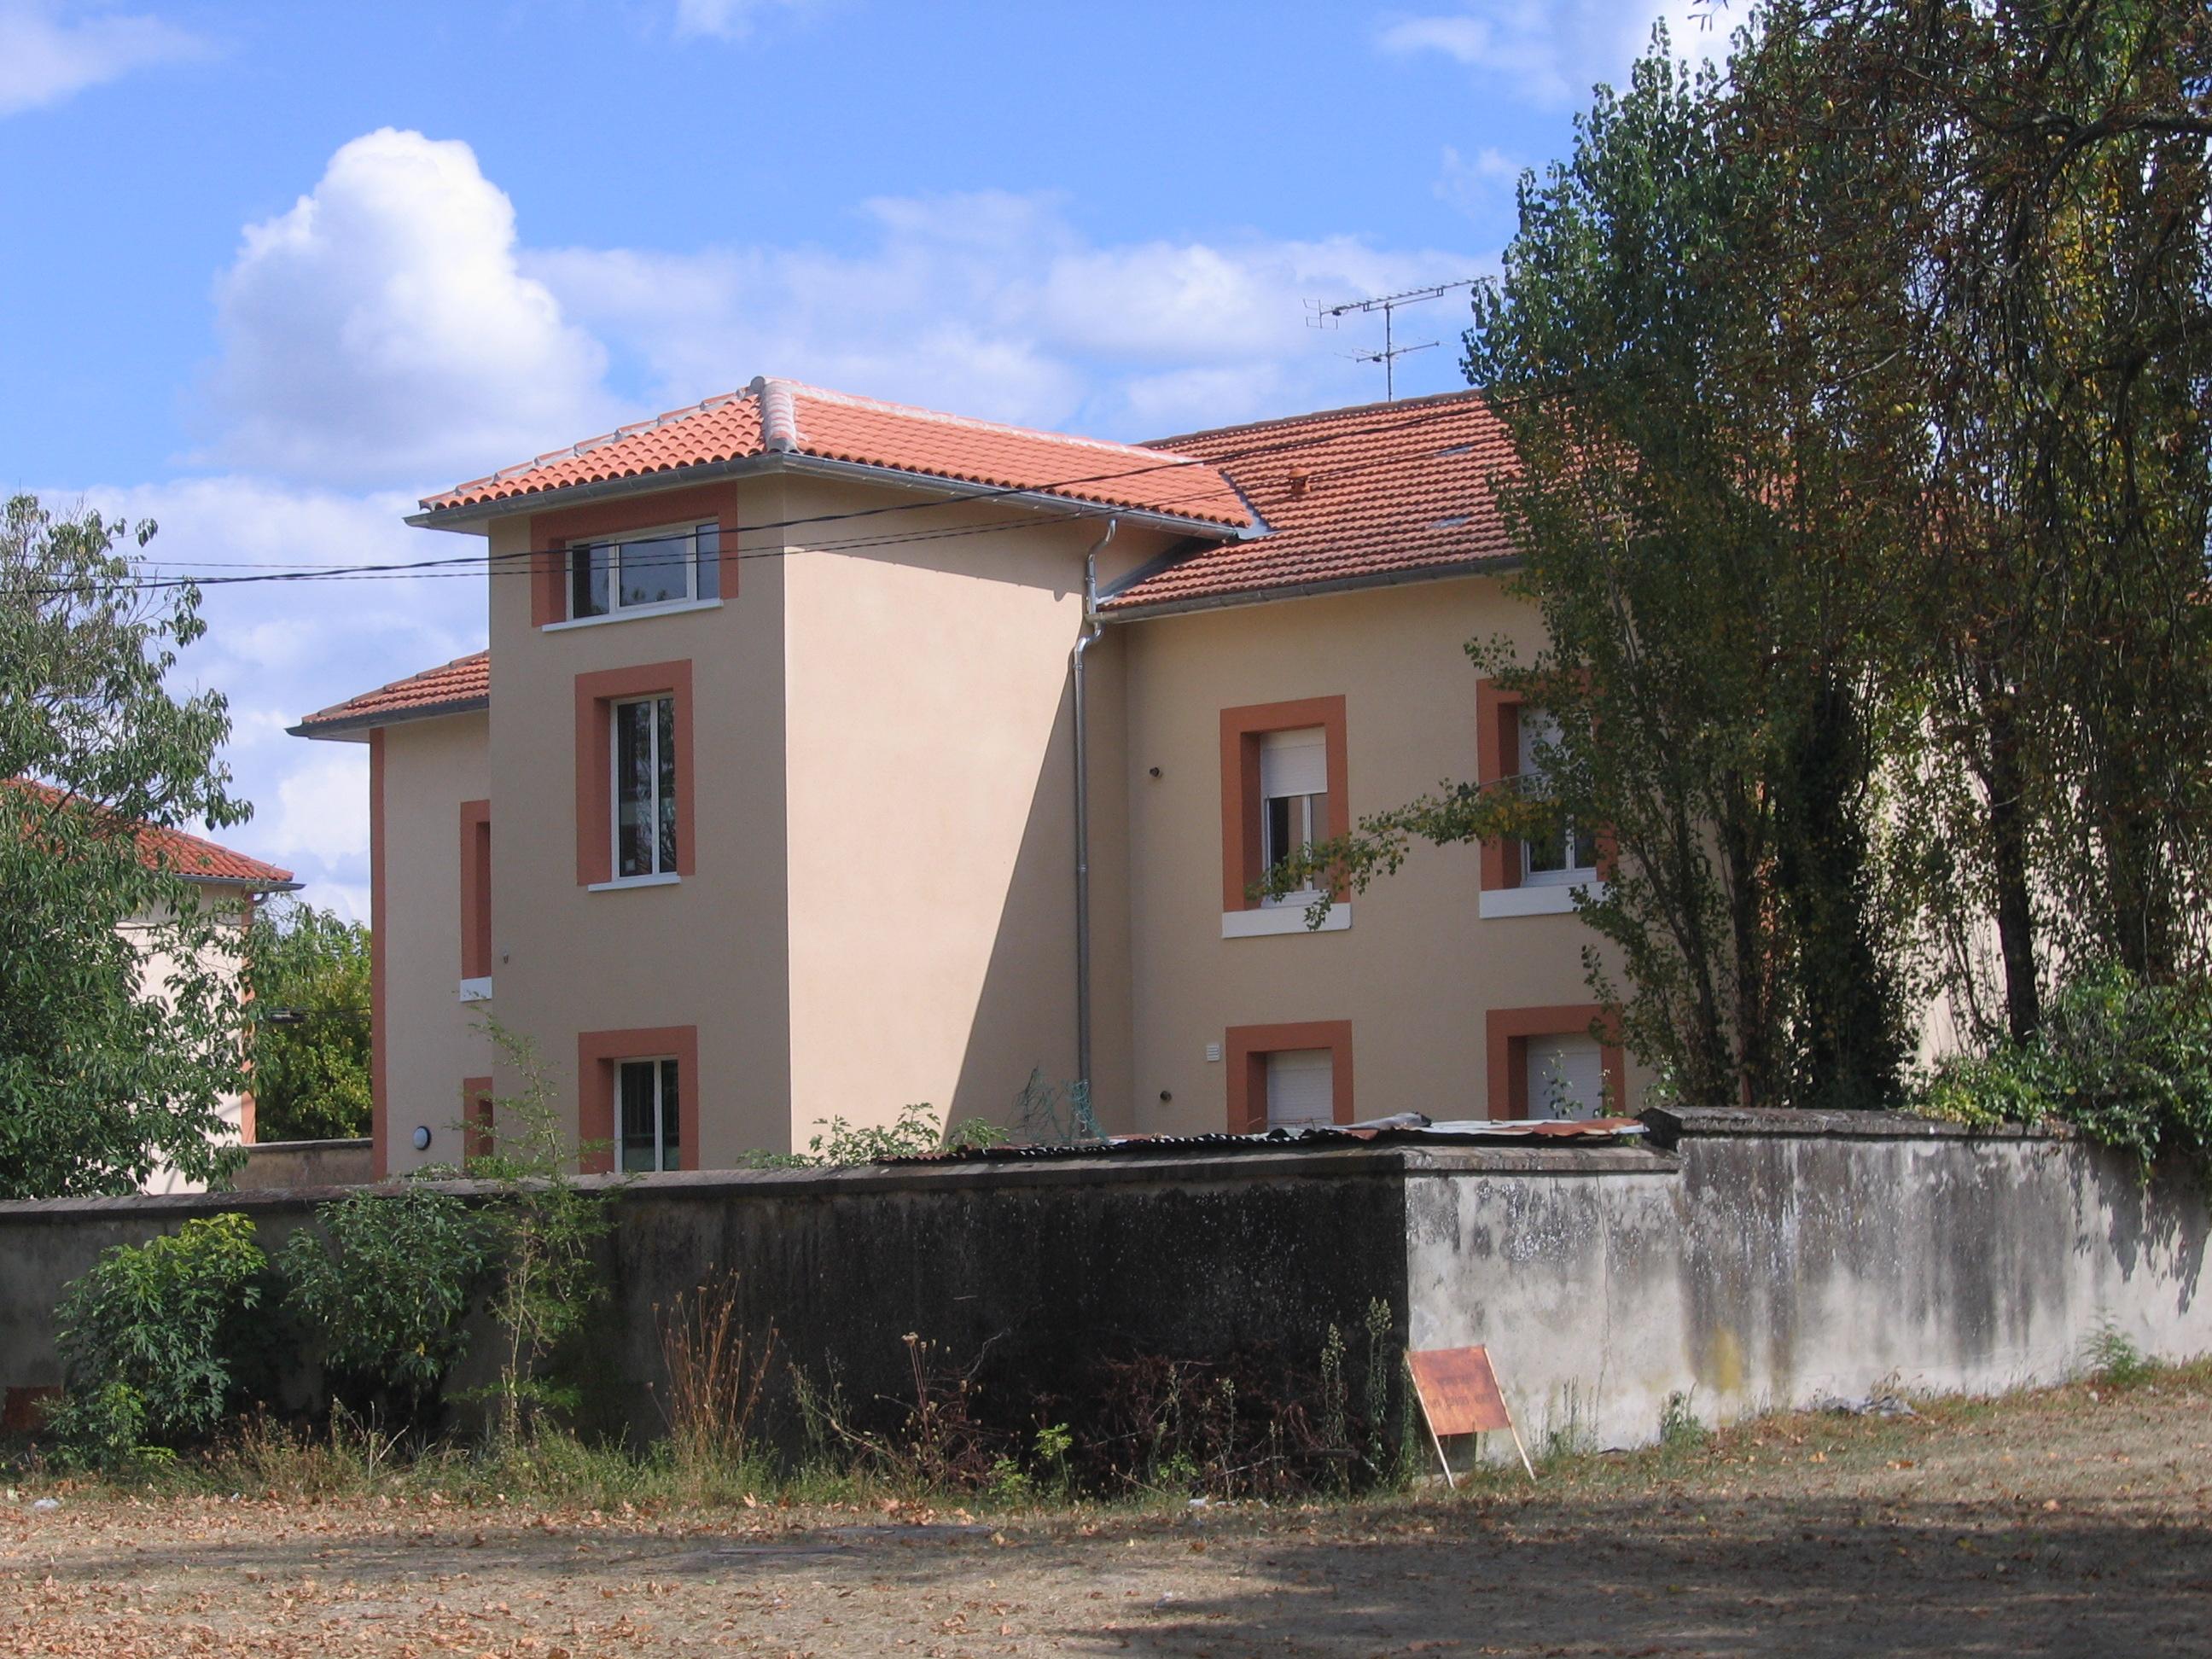 Architecte DPLG Anne-Marie Taupiac - Habitats Collectifs